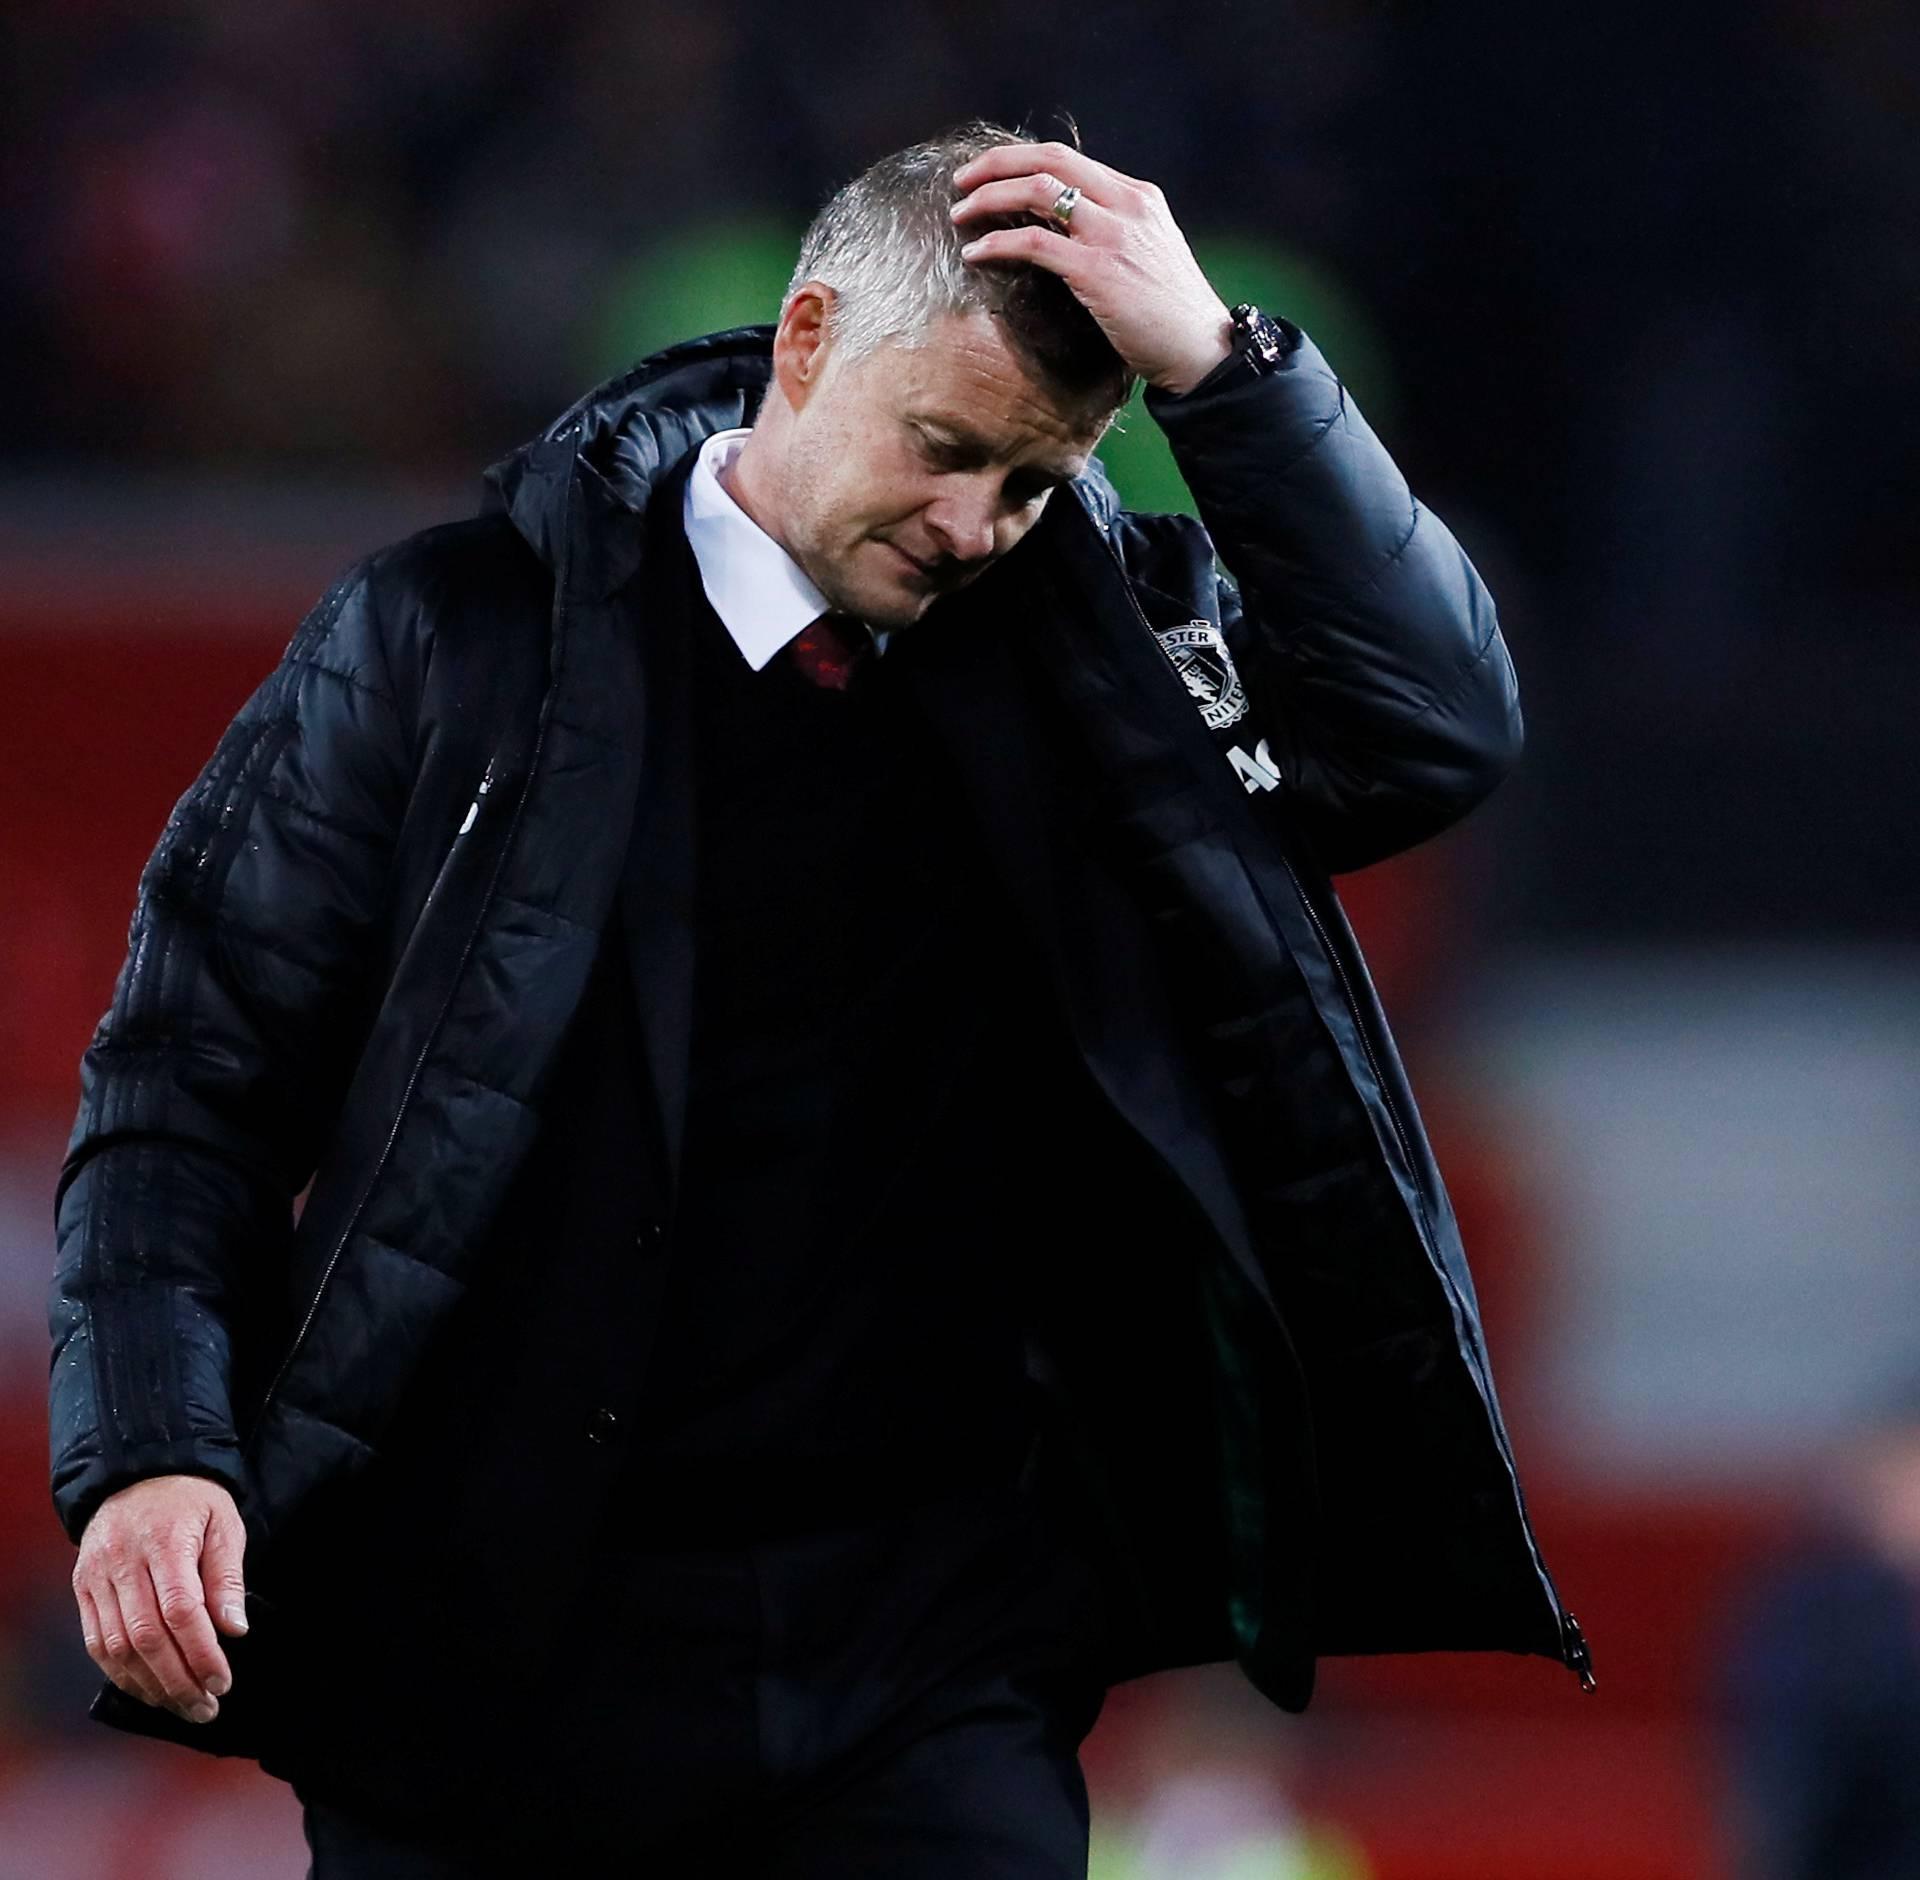 Premier League - Manchester United v Arsenal